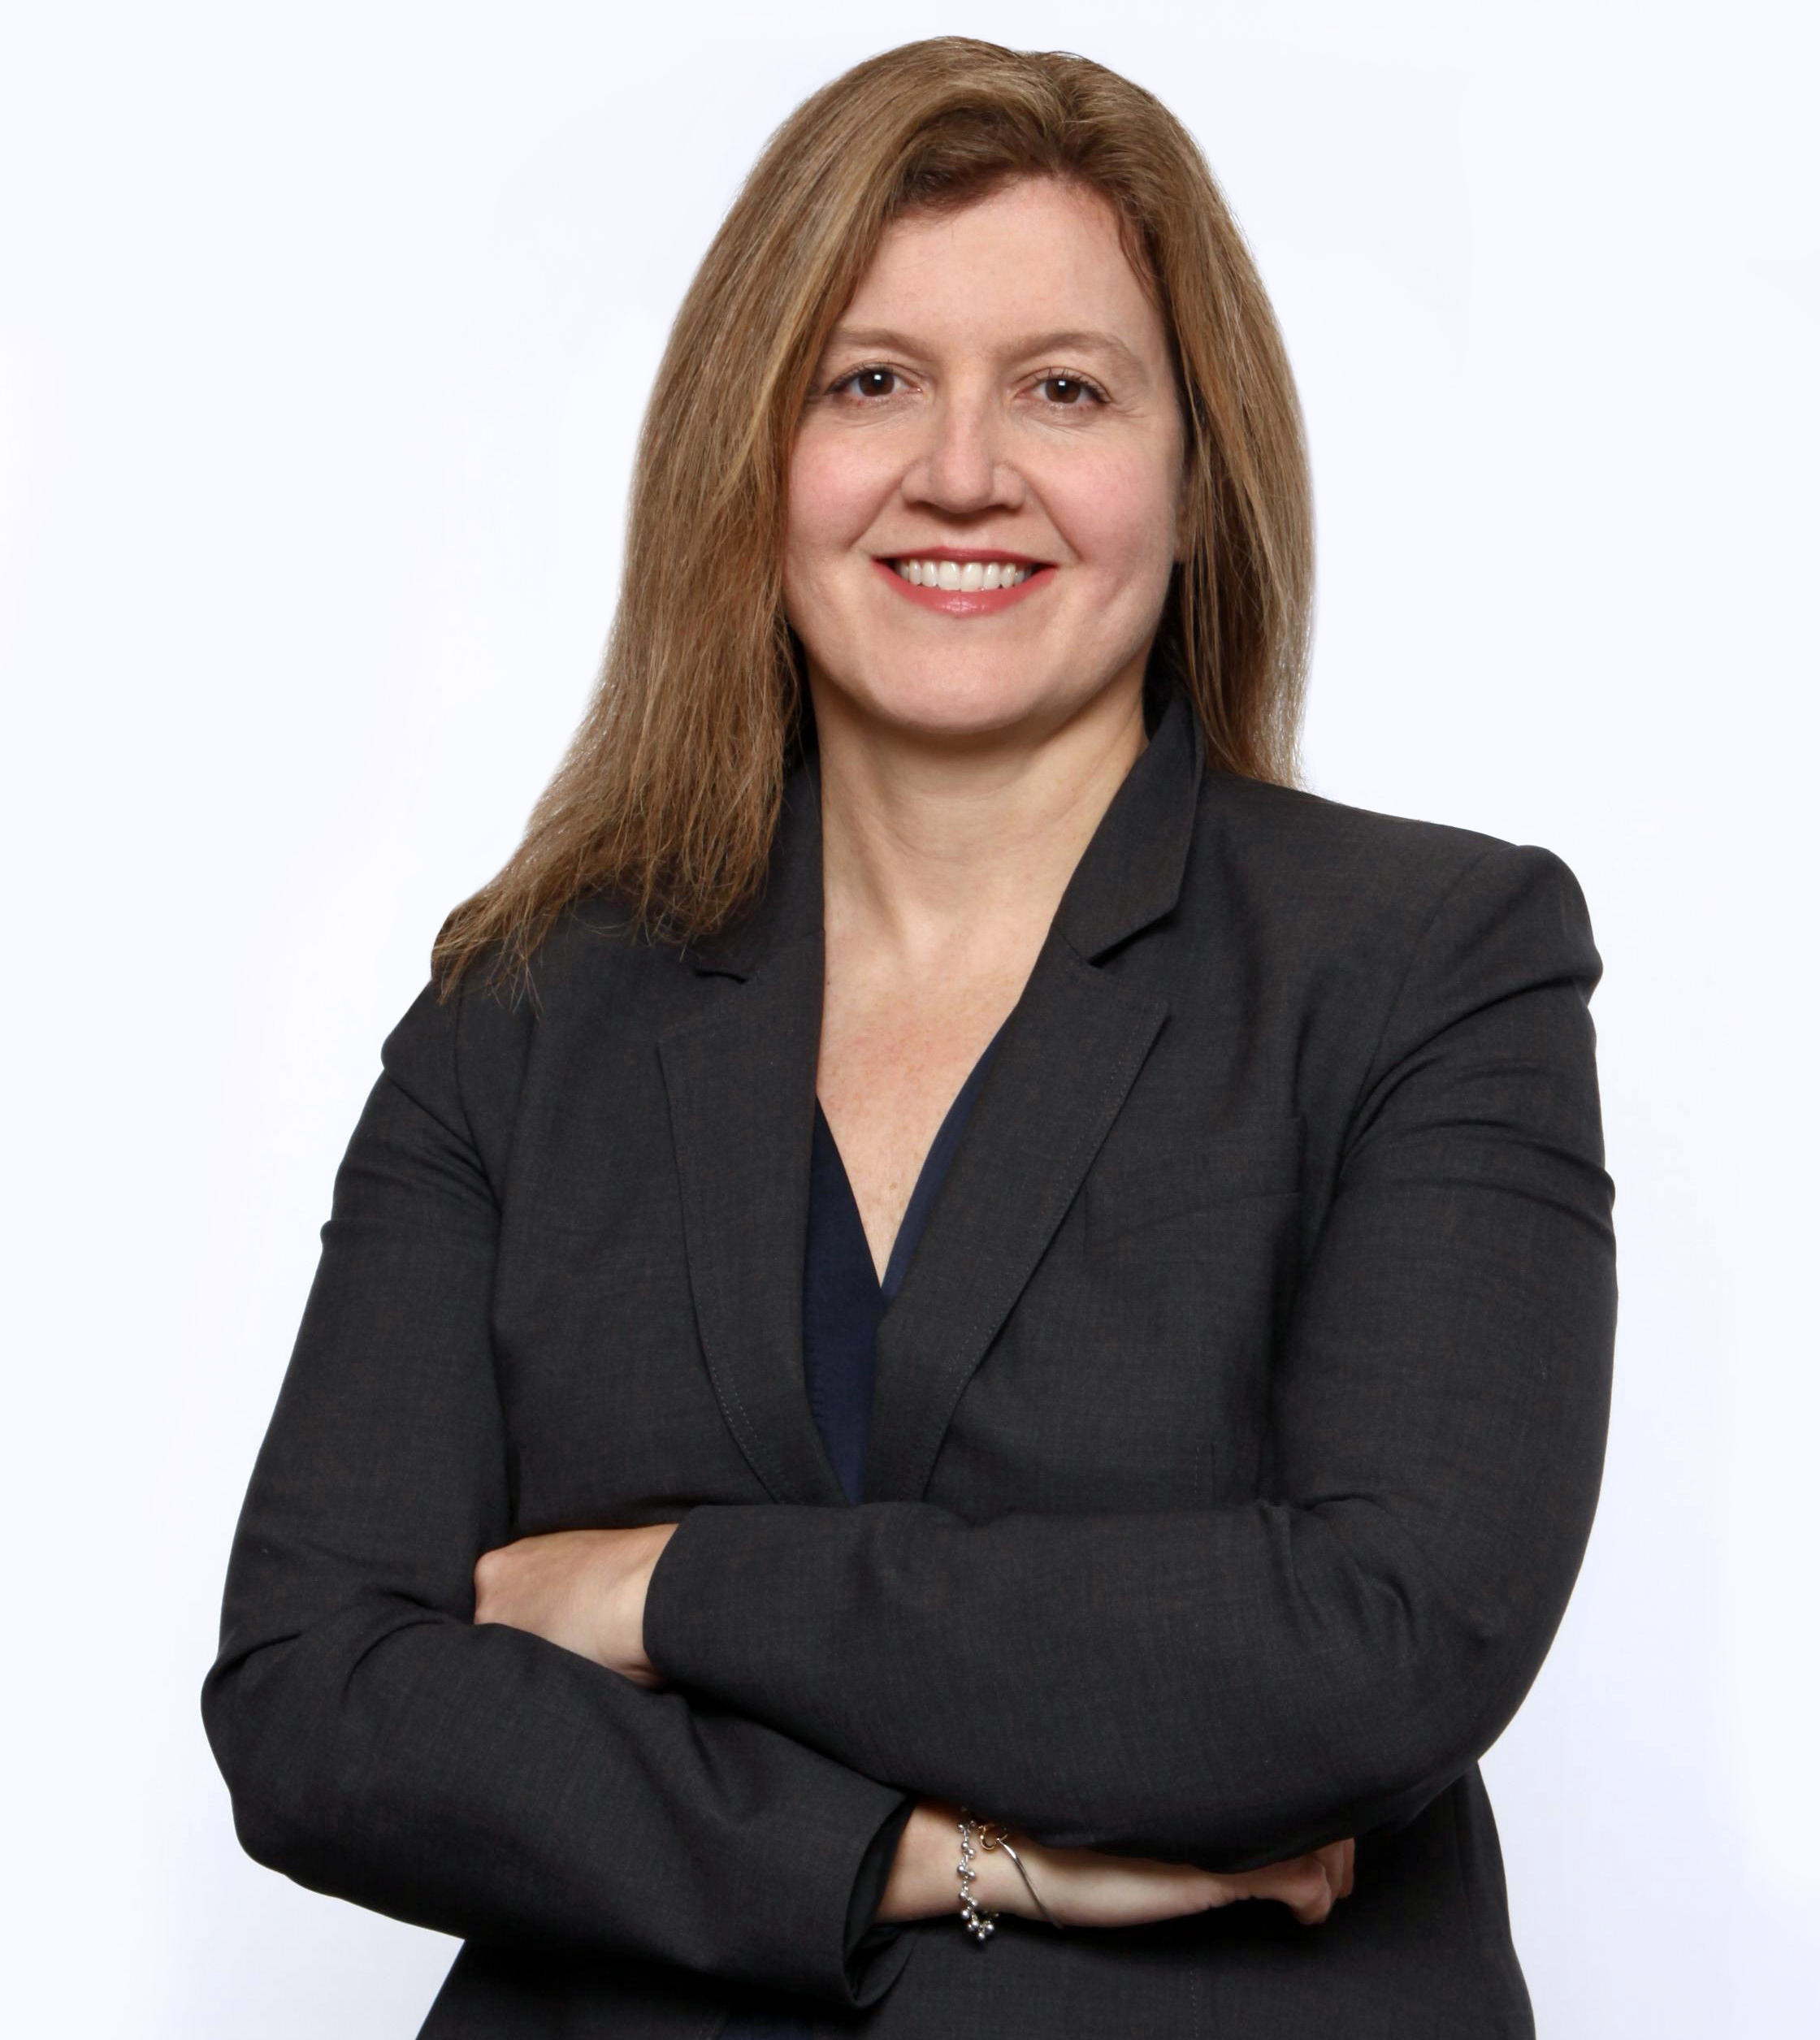 Suzanne Hallsworth